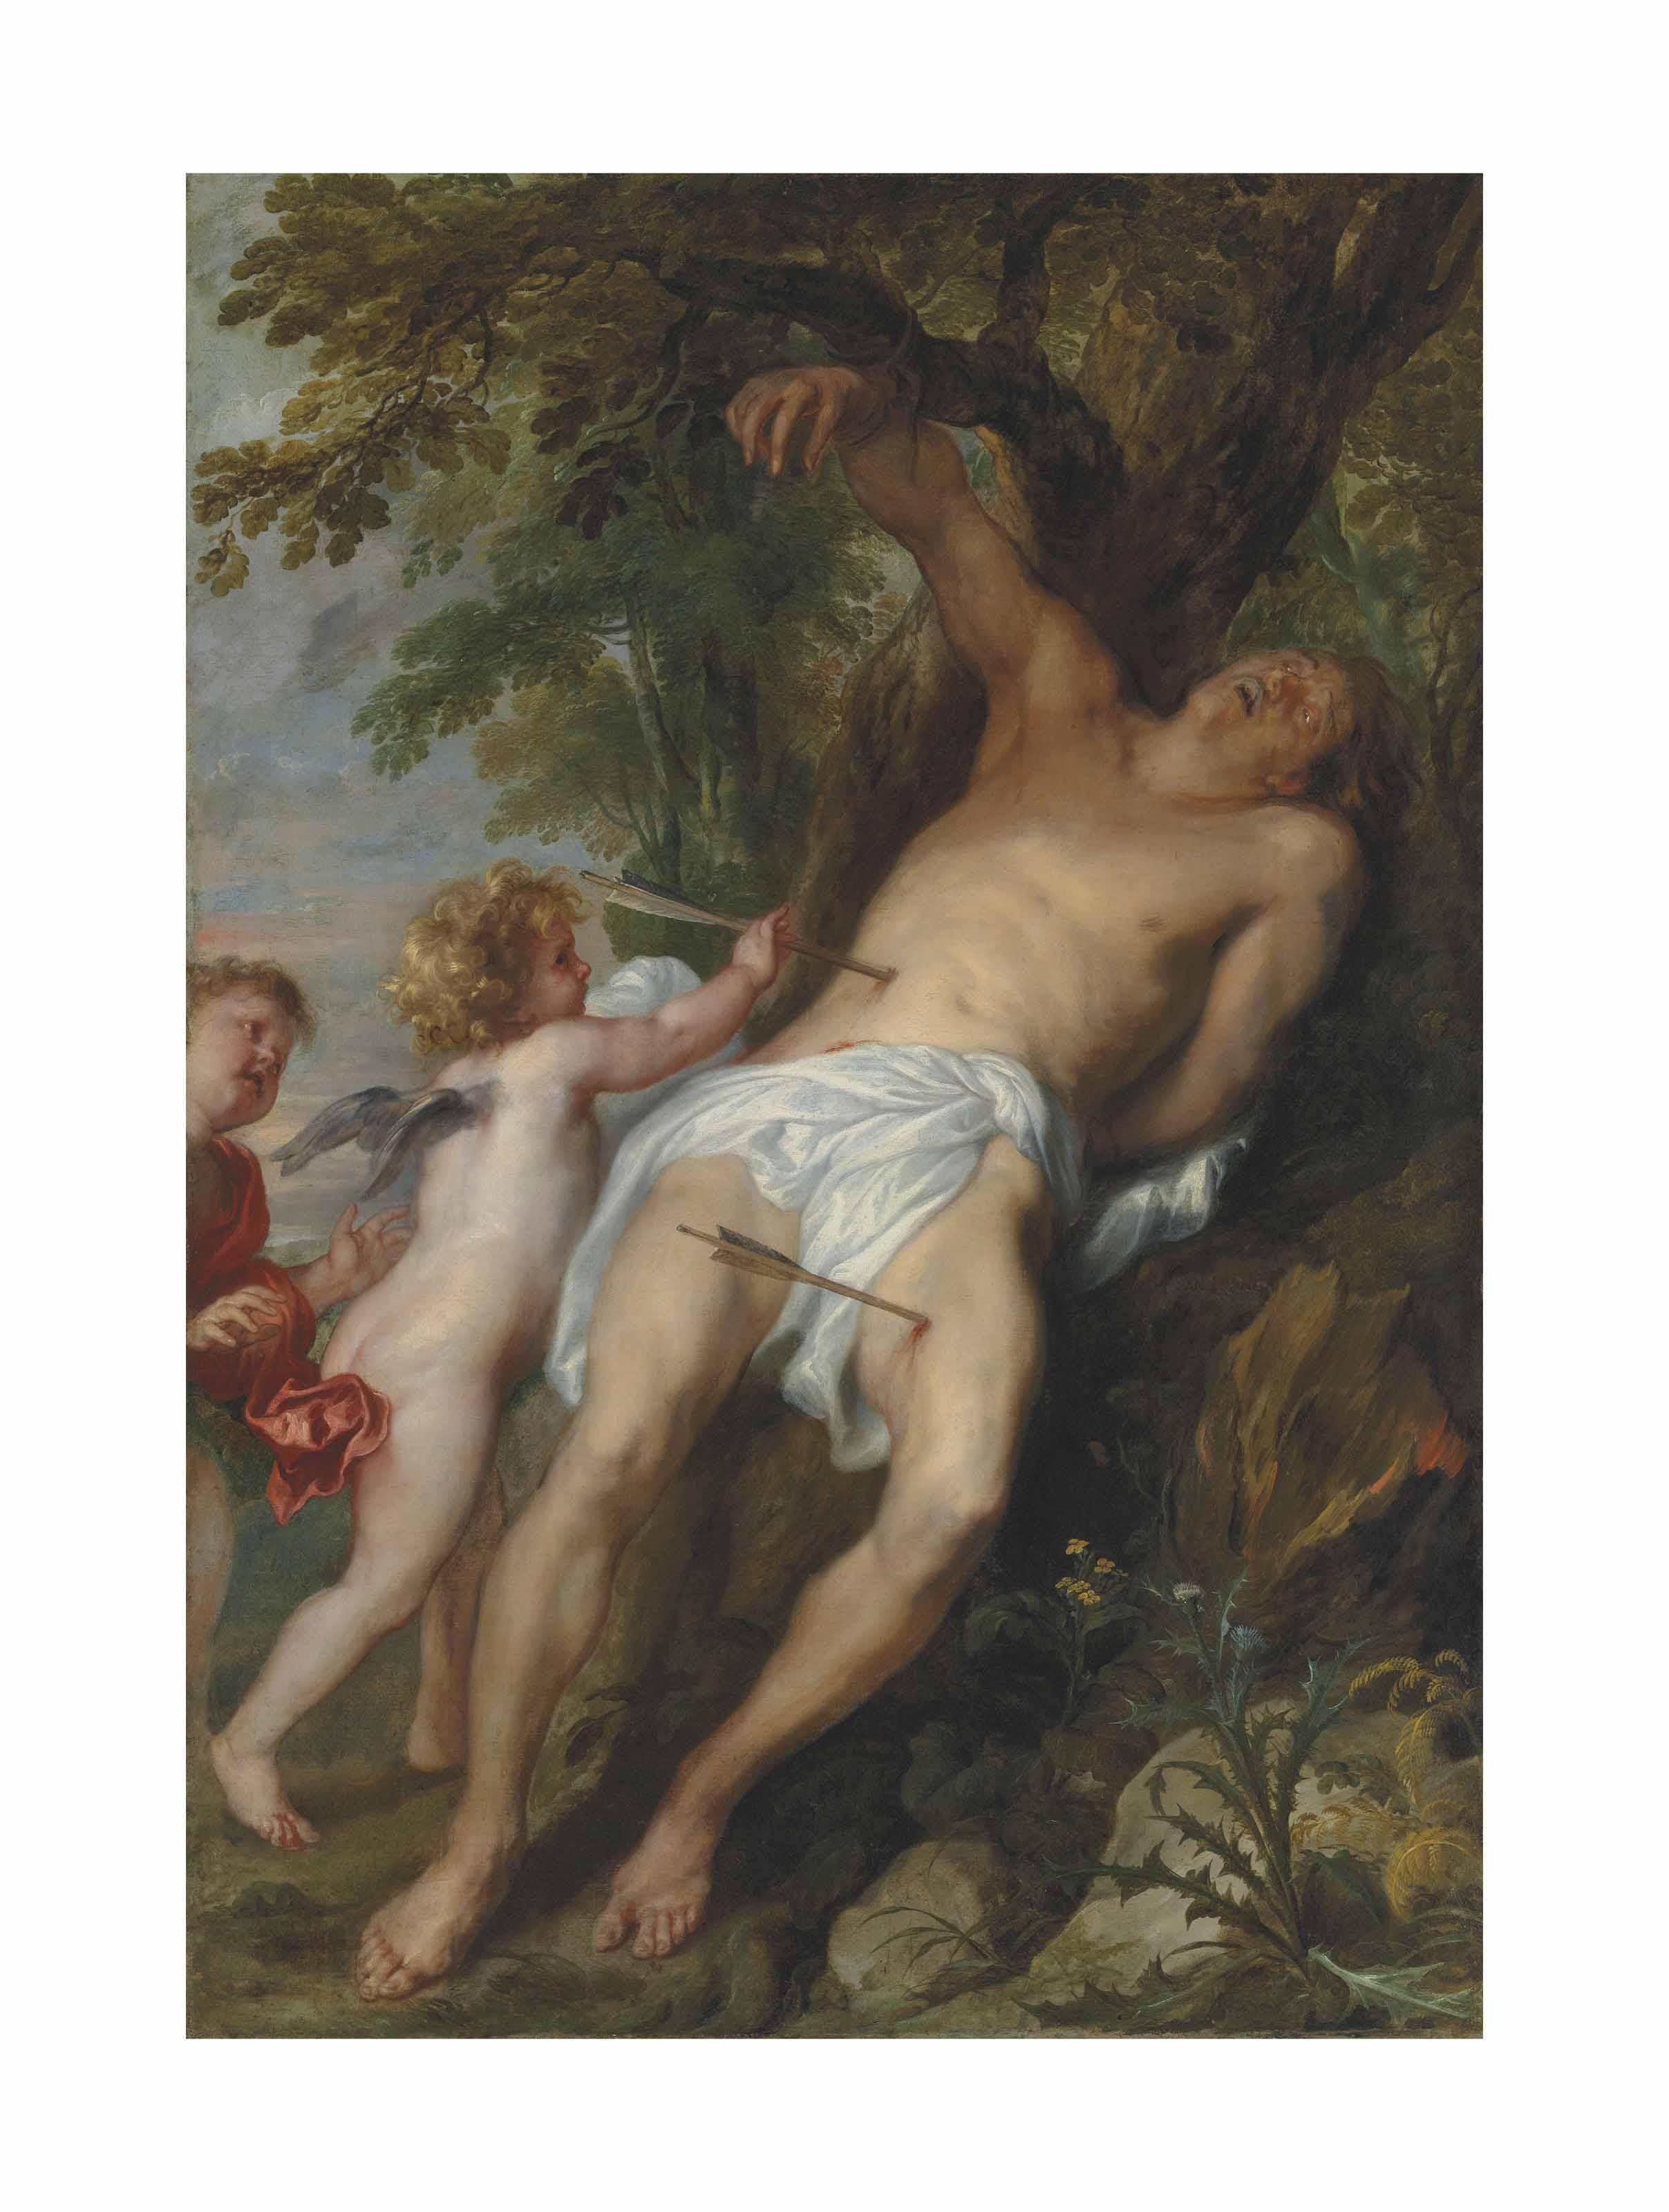 Sir Anthony van Dyck (Antwerp 1599-1641 London)